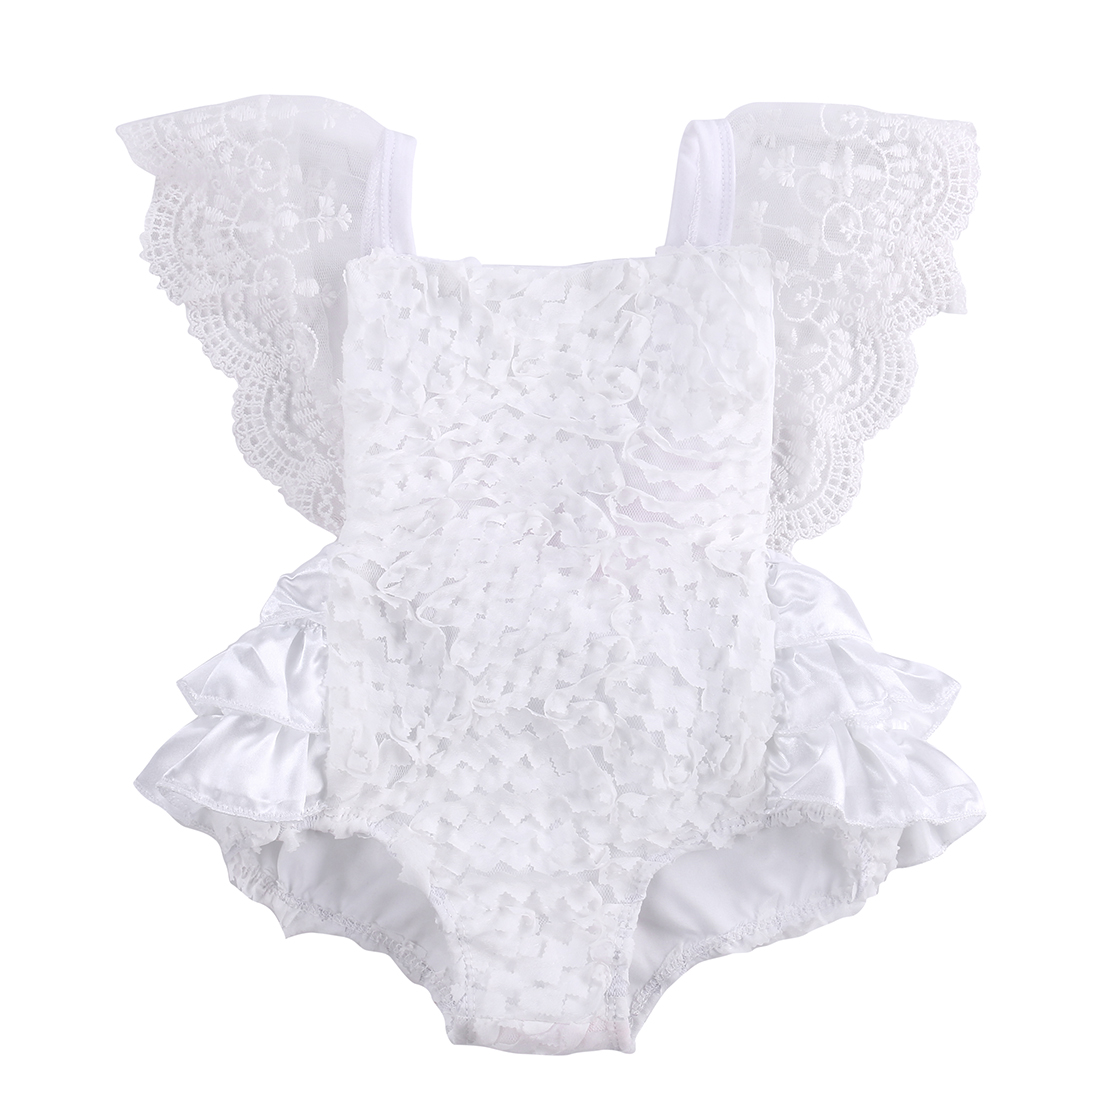 2016 fashion baby bodysuit wholesale kids baby girls sleeveless lace garden cake bodysuit sunsuit Outfits